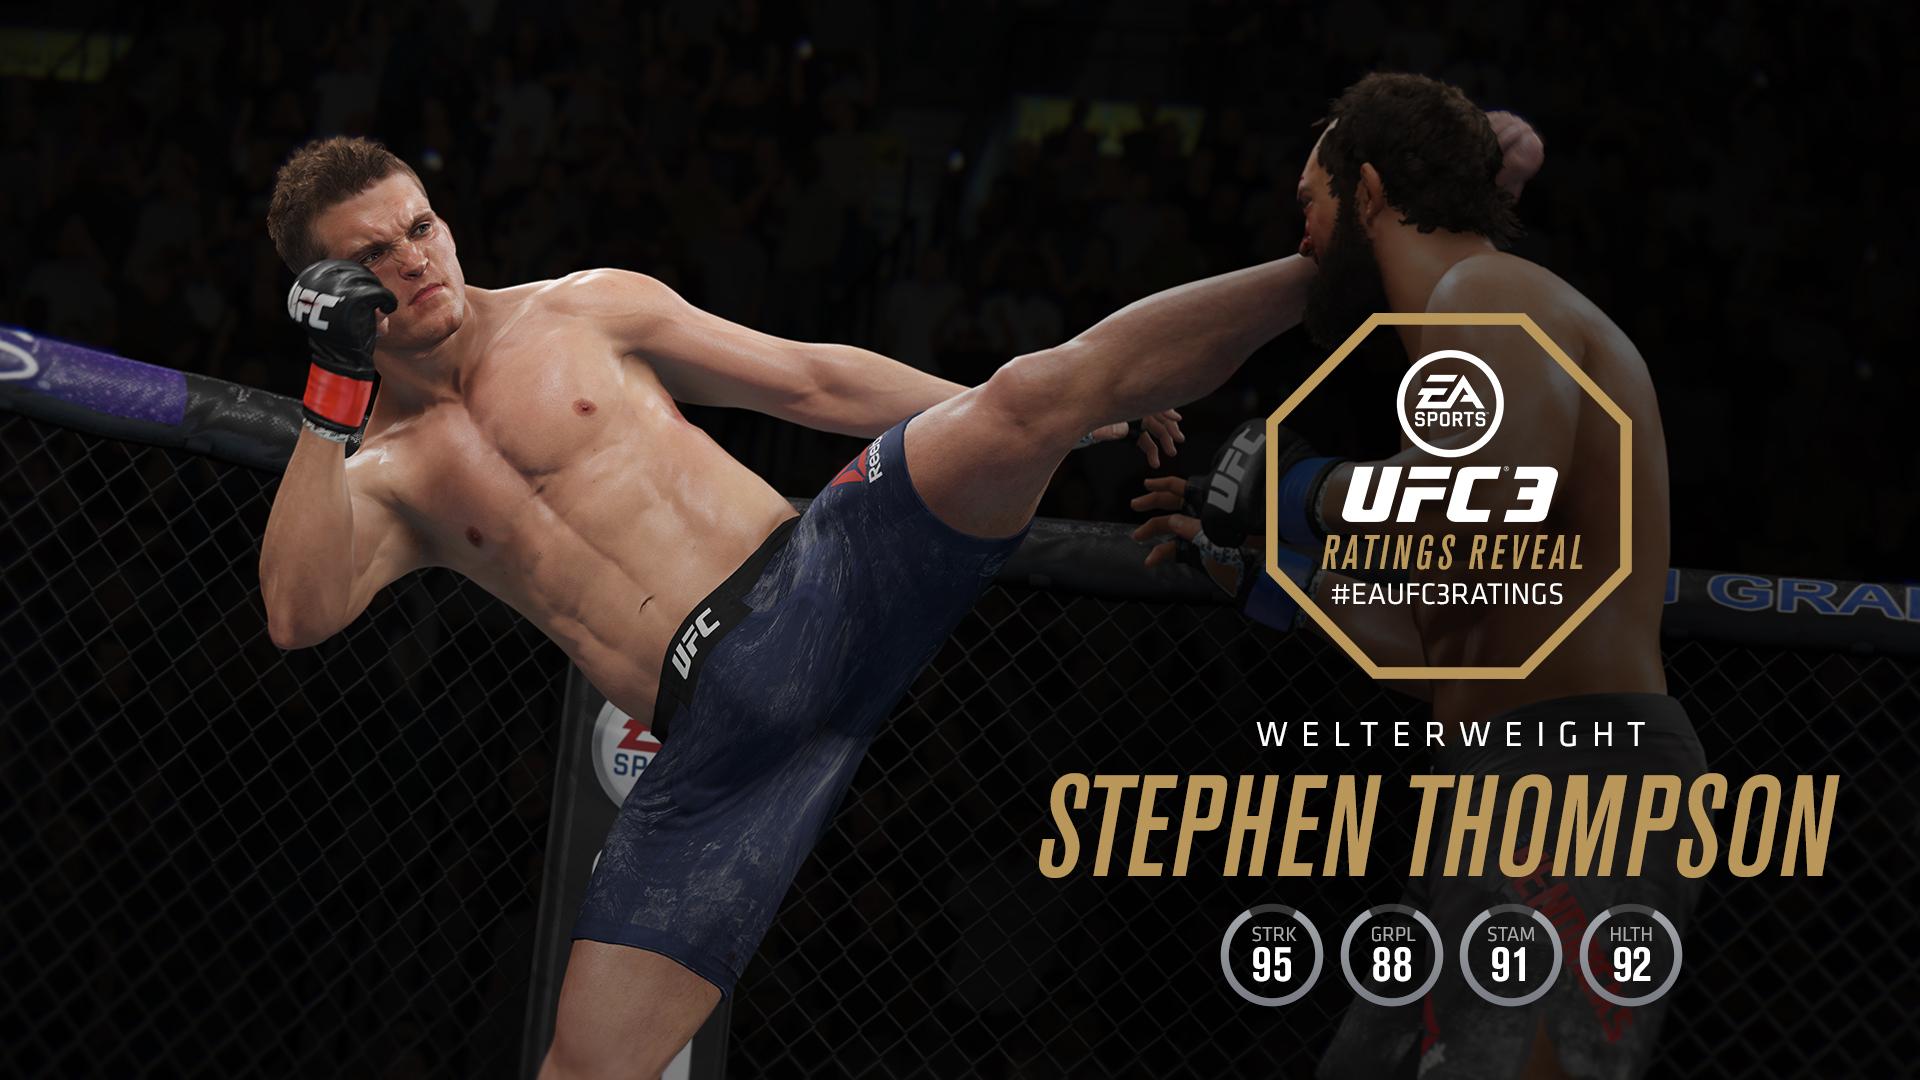 StephenThompson_Welterweight_1920x1080